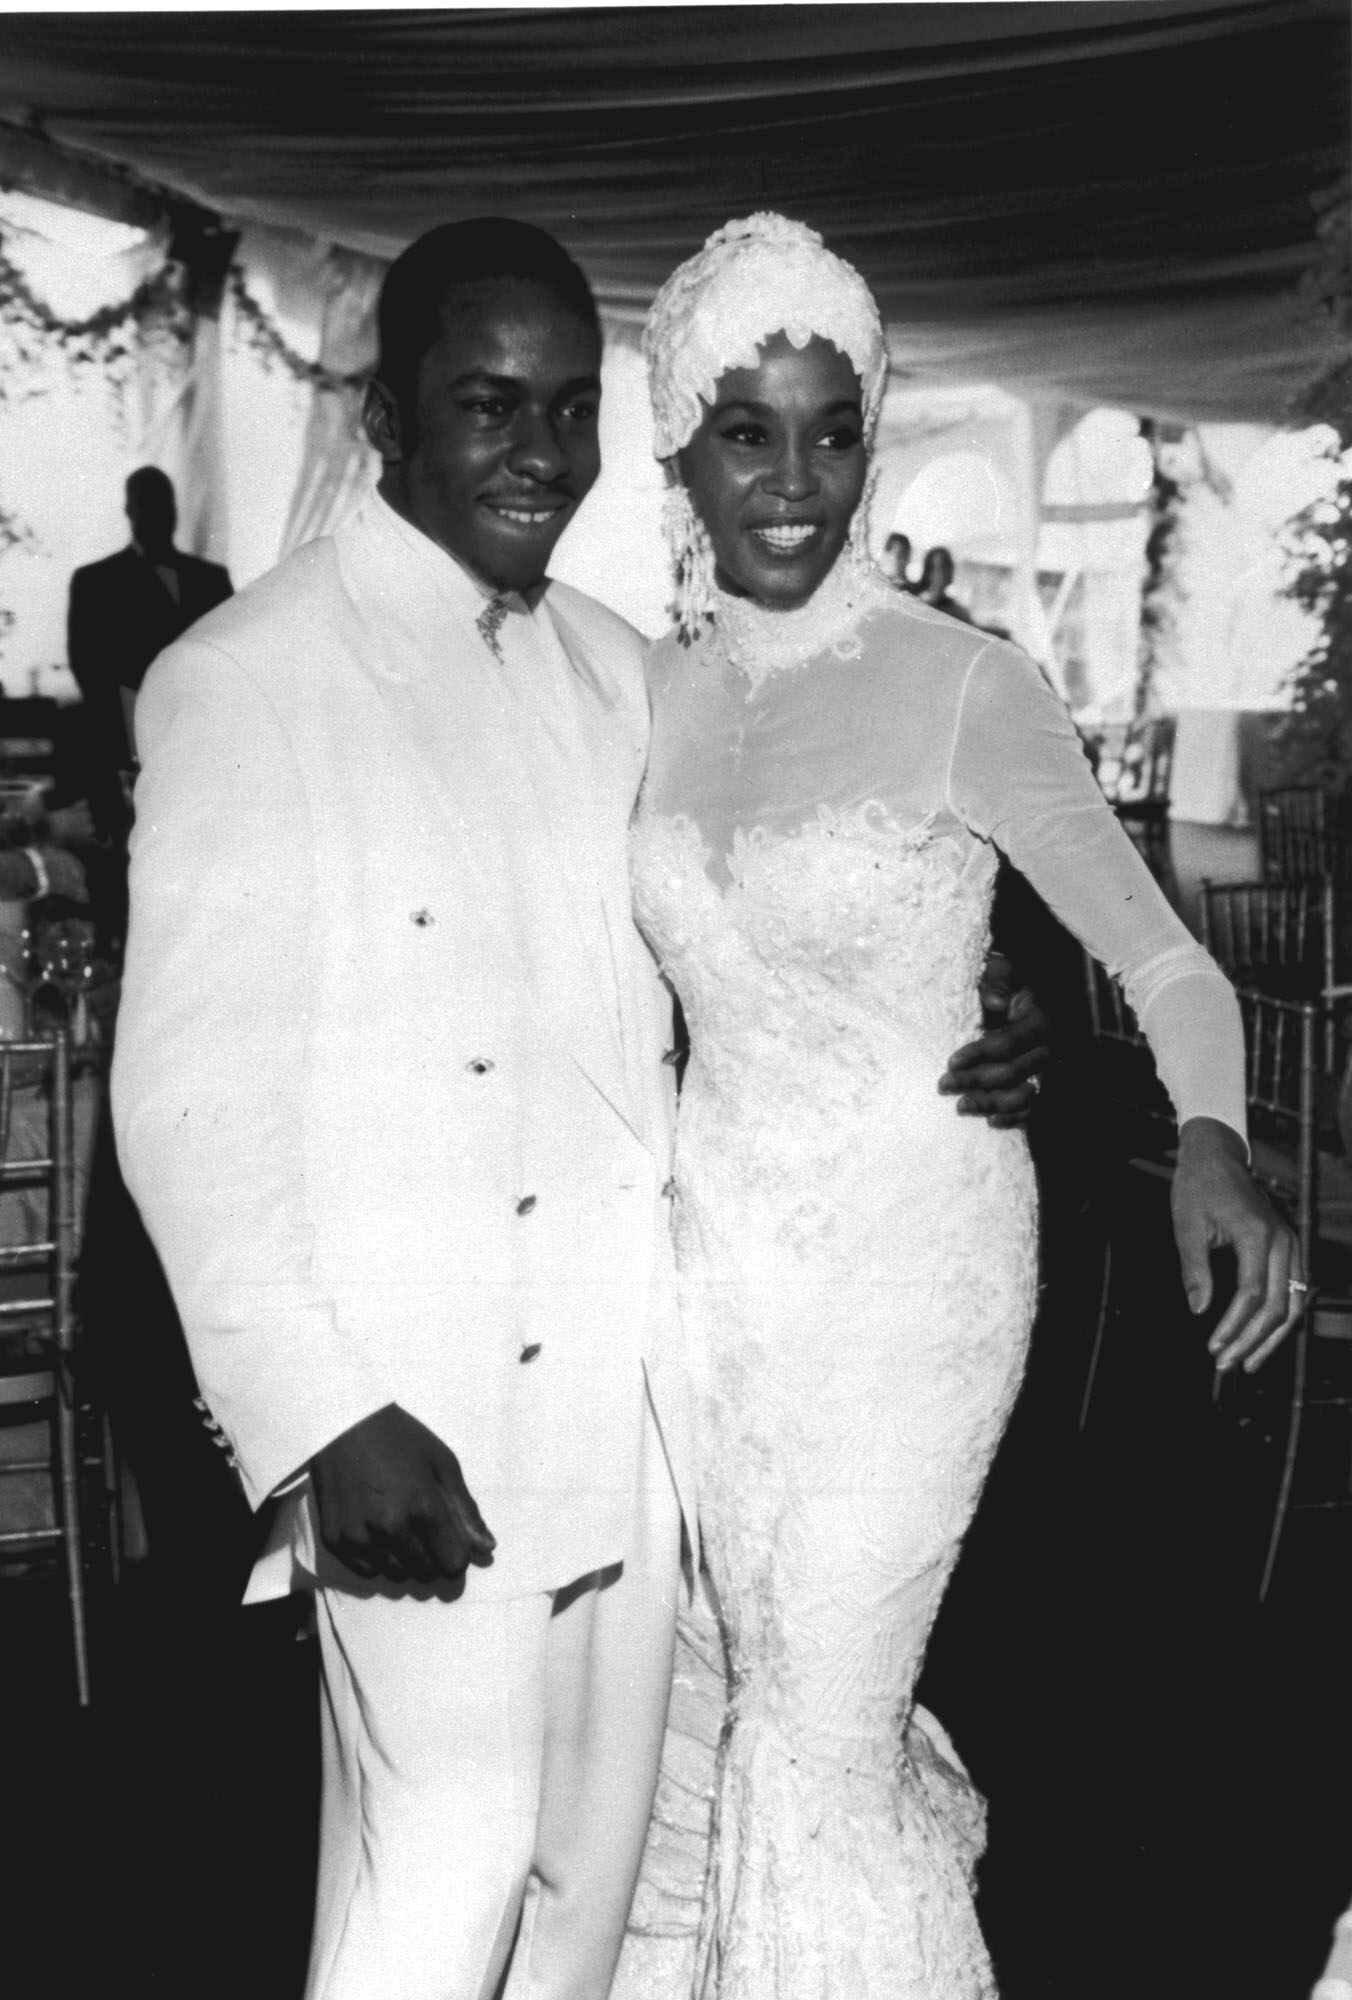 HOUSTON BROWN WEDDING